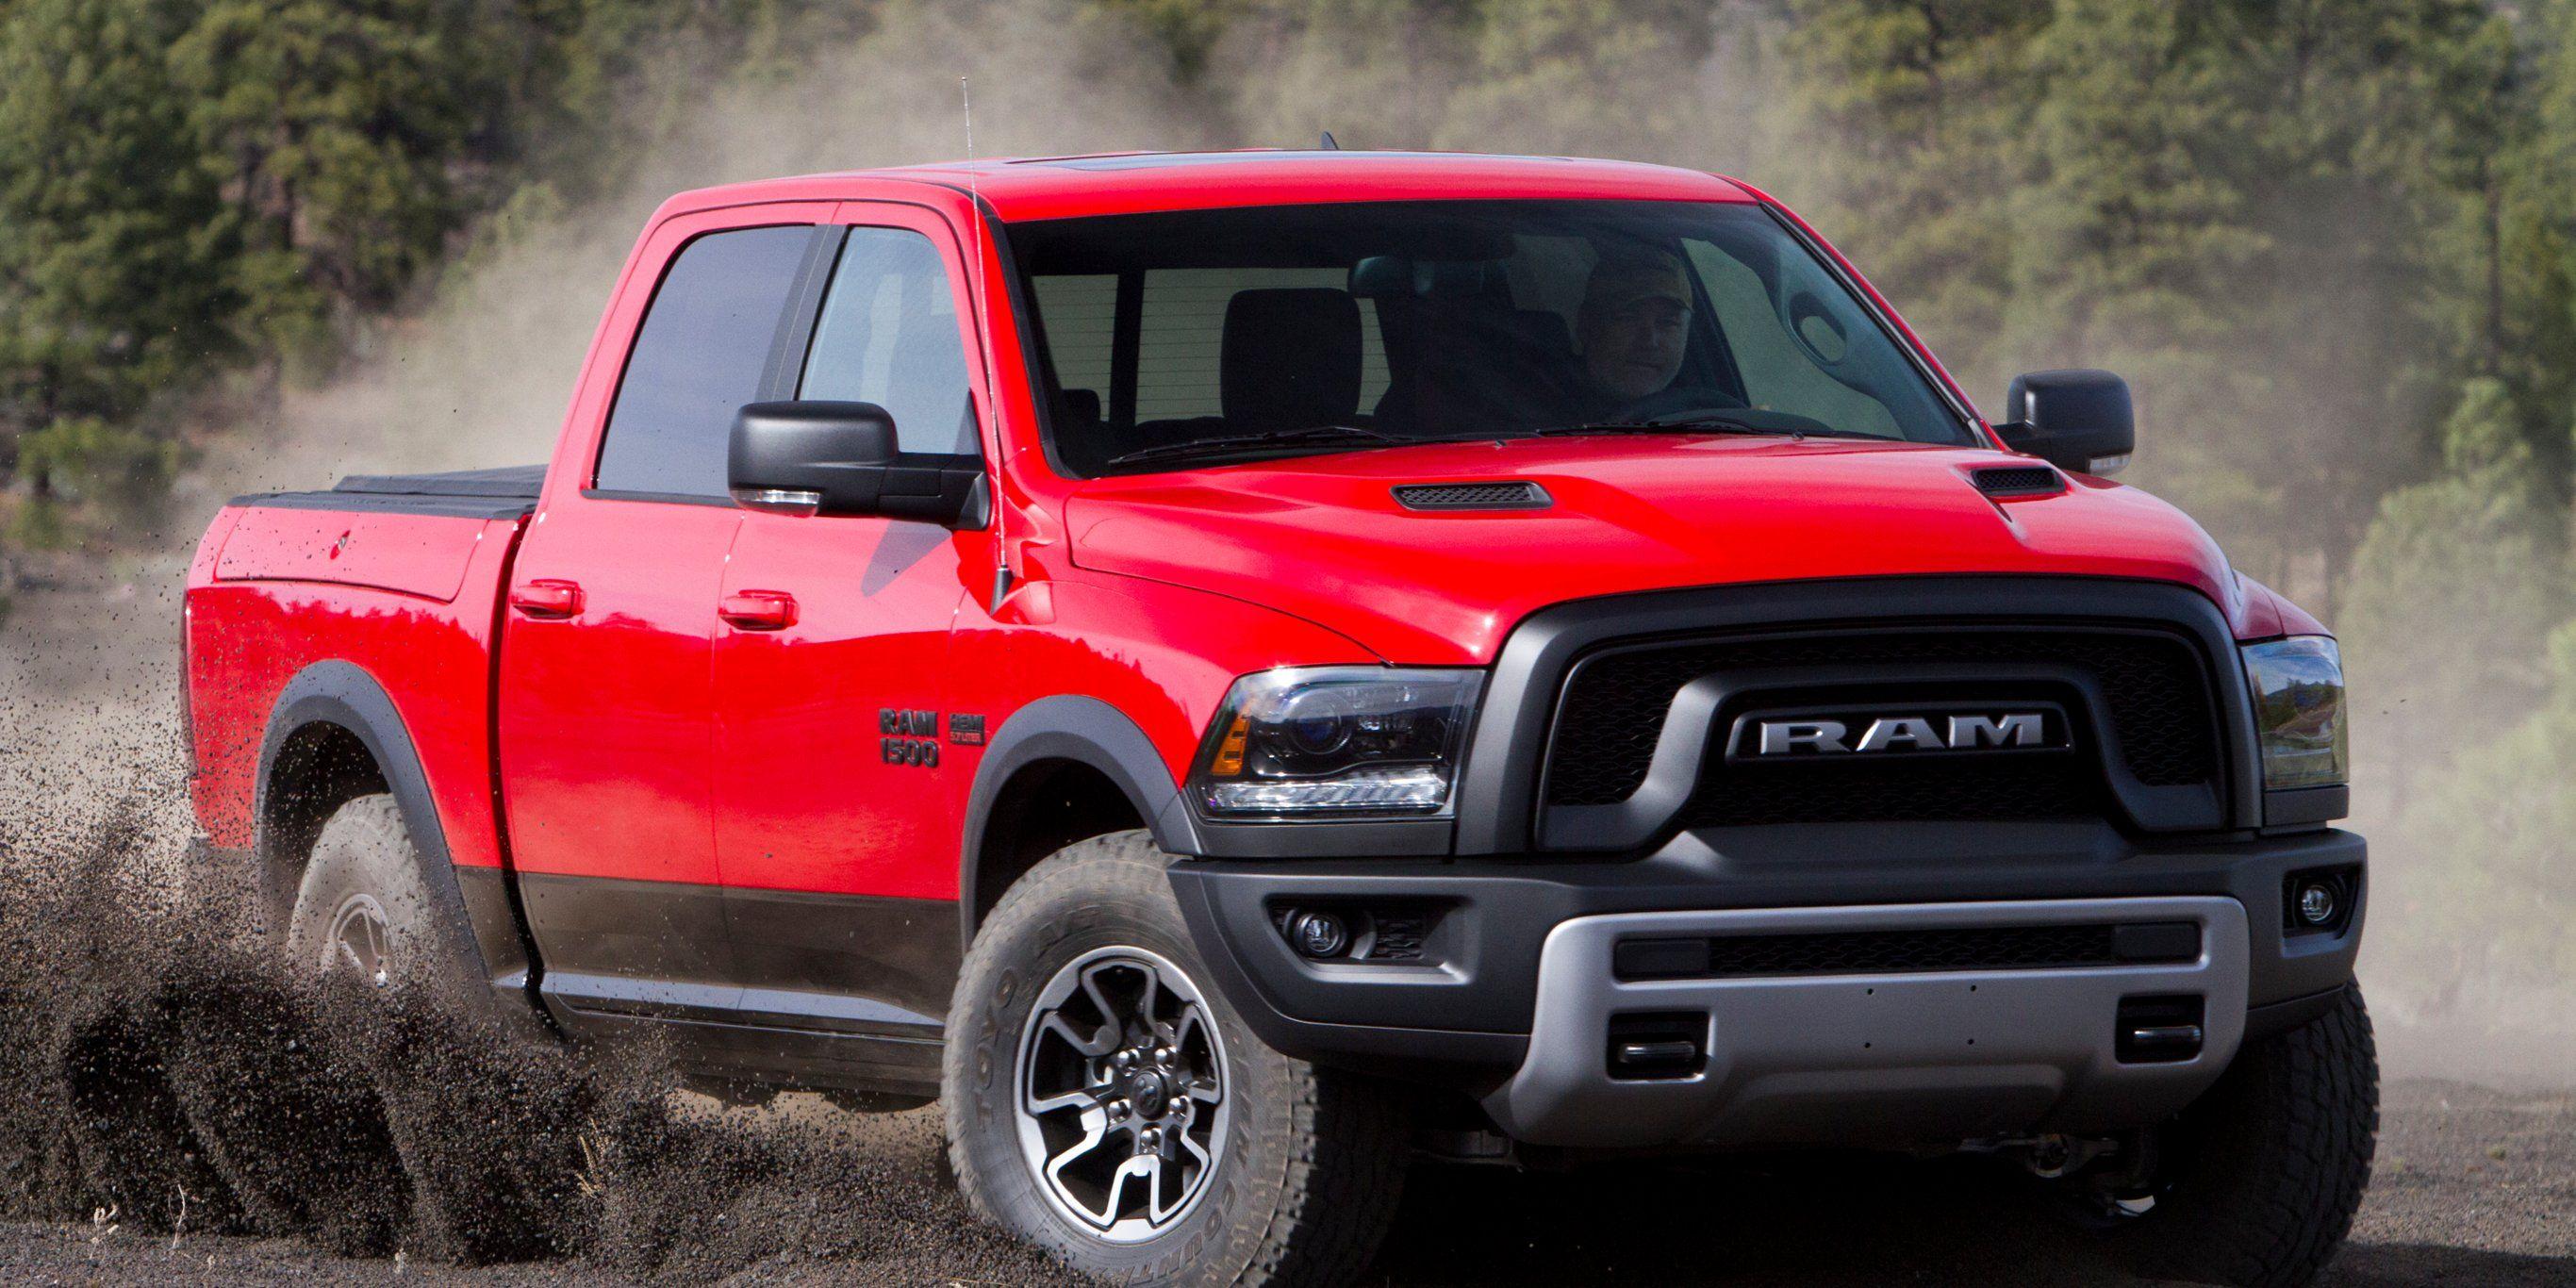 Best usedcar deals for trucks and suvs pickup trucks